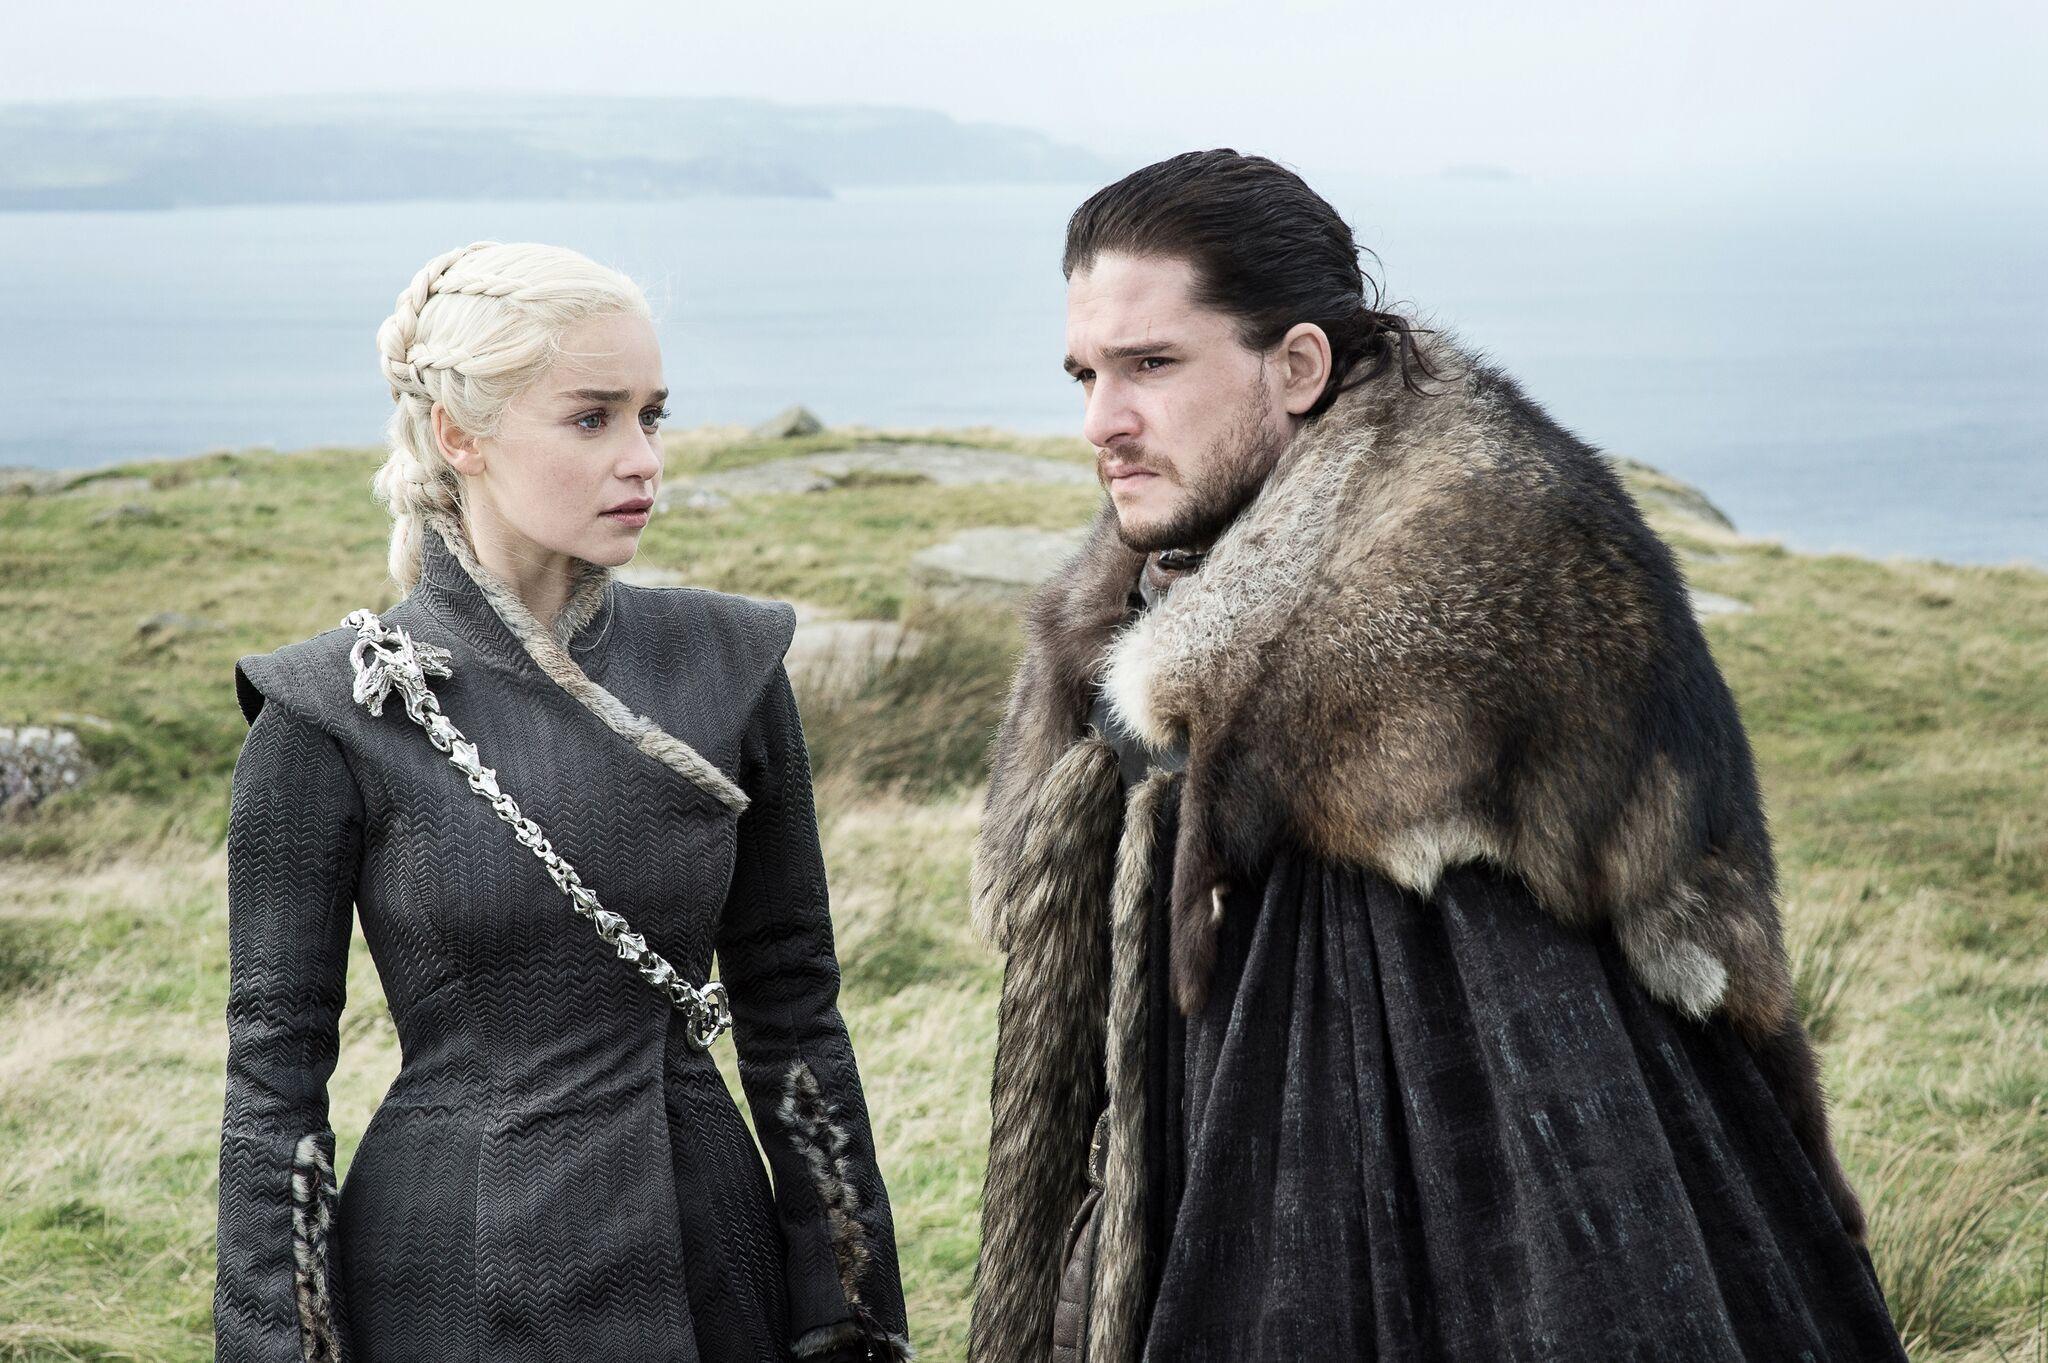 Dany and Jon, Eastwatch 7.5 Game of Thrones. Jon snow